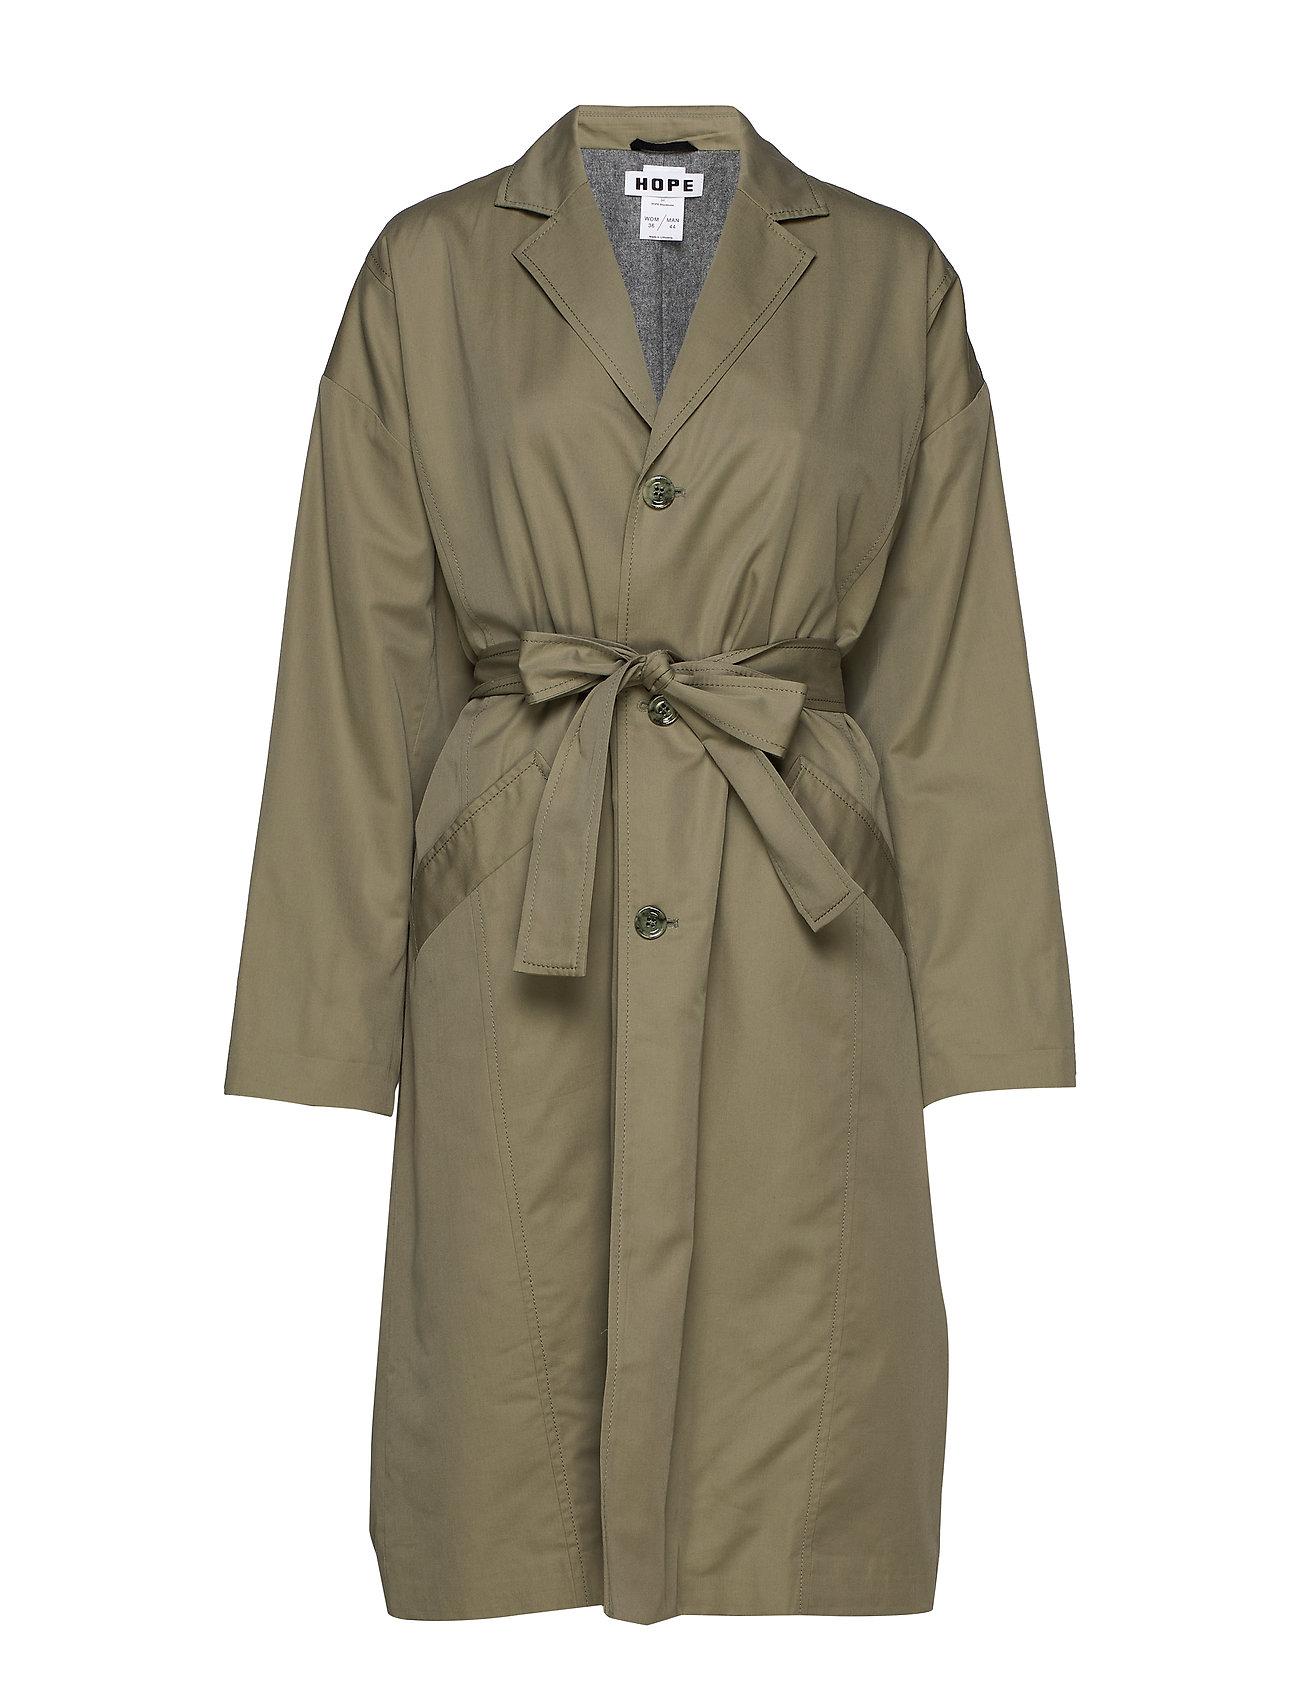 Image of Standard Coat Trenchcoat Frakke Grøn Hope (3547474647)